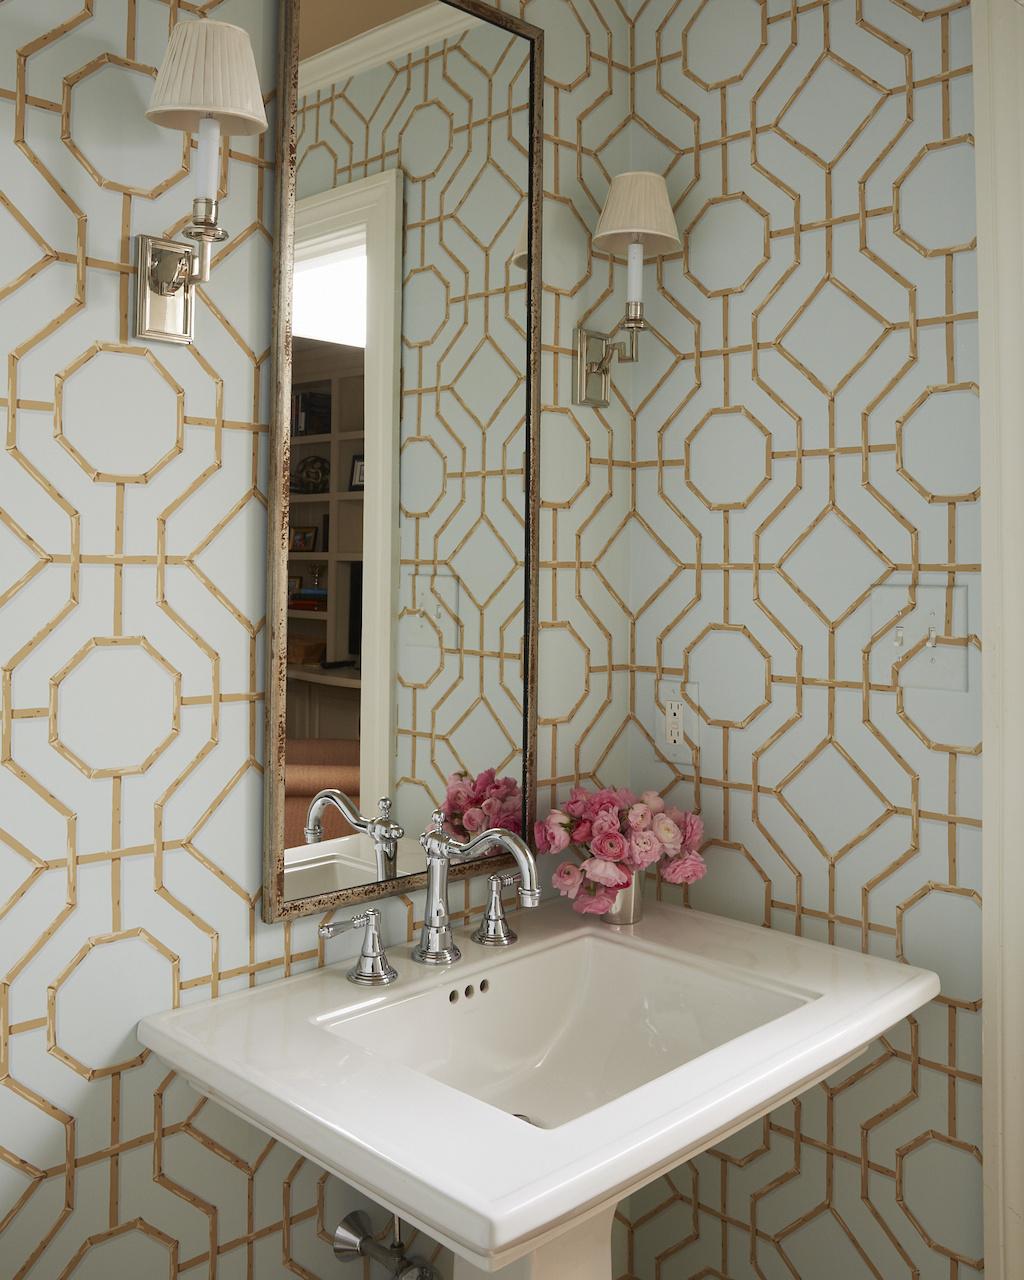 Cowtan & Tout's trellis wallpaper adds dimensionandarchitectural interest to the powder room.